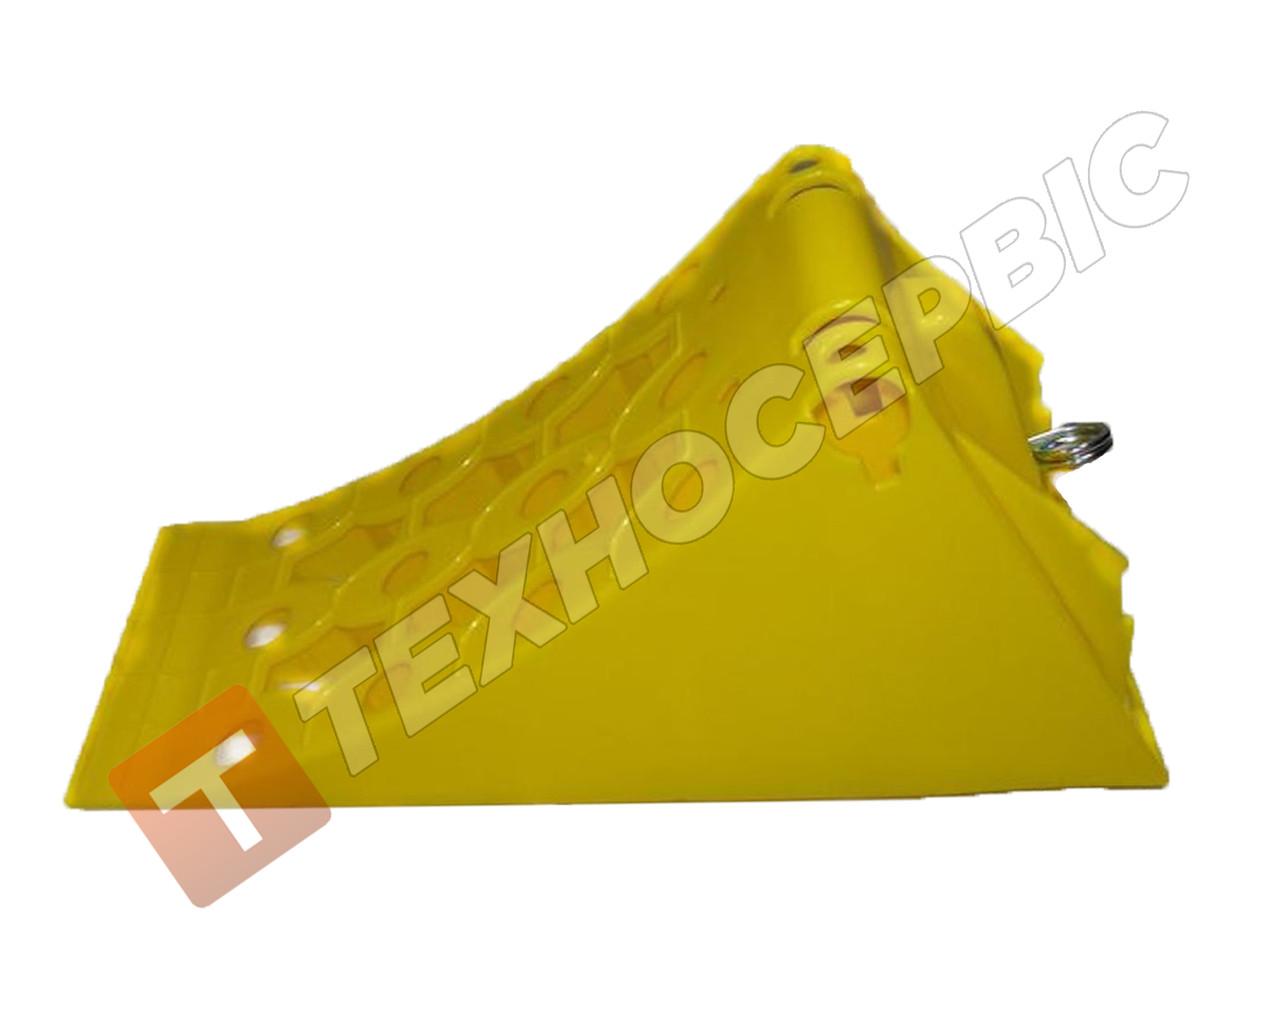 Противооткатные упоры для грузовиков пластик 415х160х190(мм),Турция